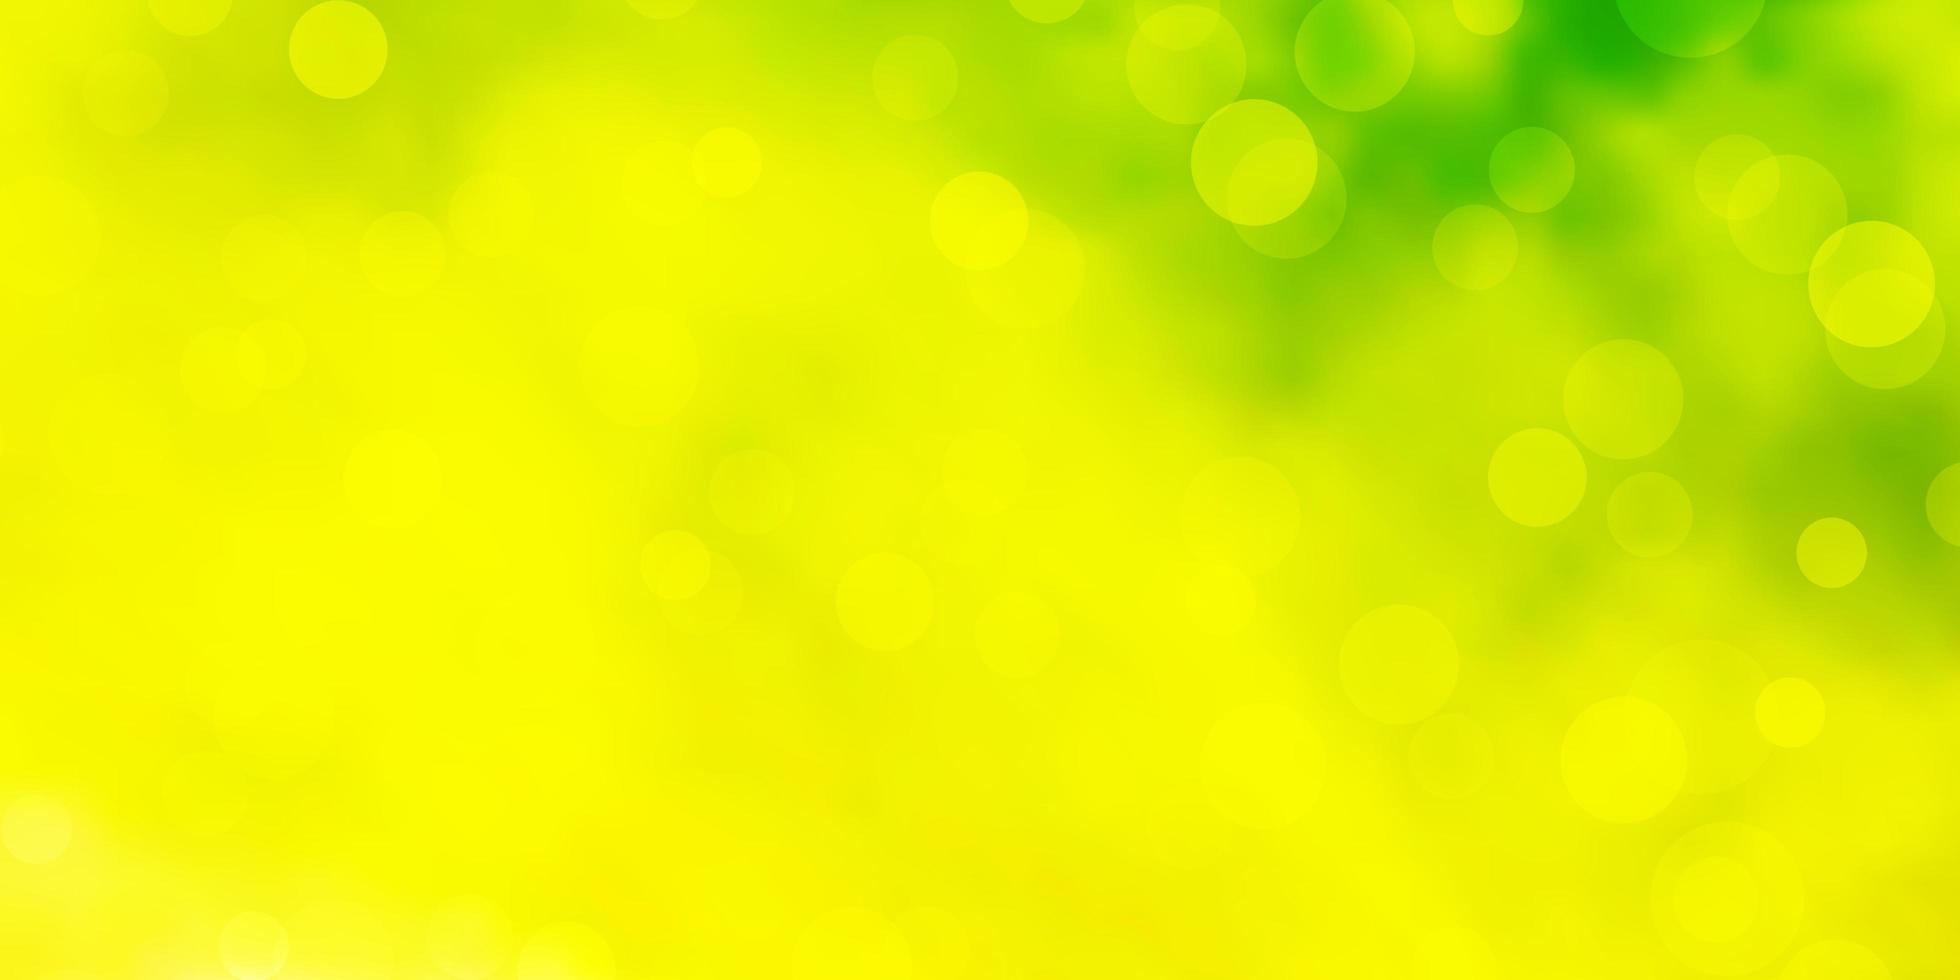 hellgrünes, gelbes Vektormuster mit Kugeln. vektor